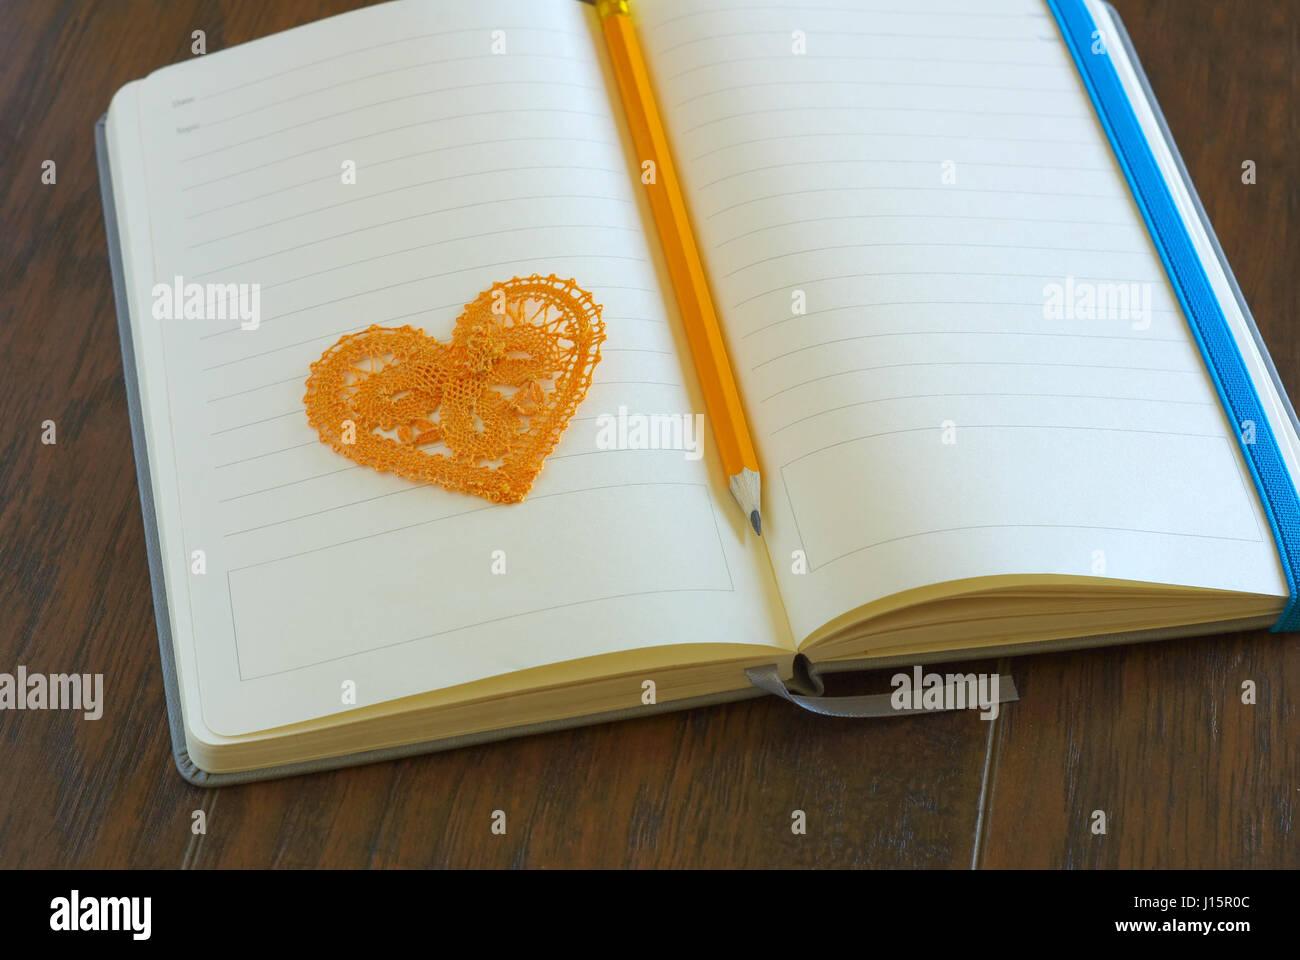 Heart symbol with pencil on open blank notebook page love message heart symbol with pencil on open blank notebook page love message romance concept lyrics loveletter book buycottarizona Gallery